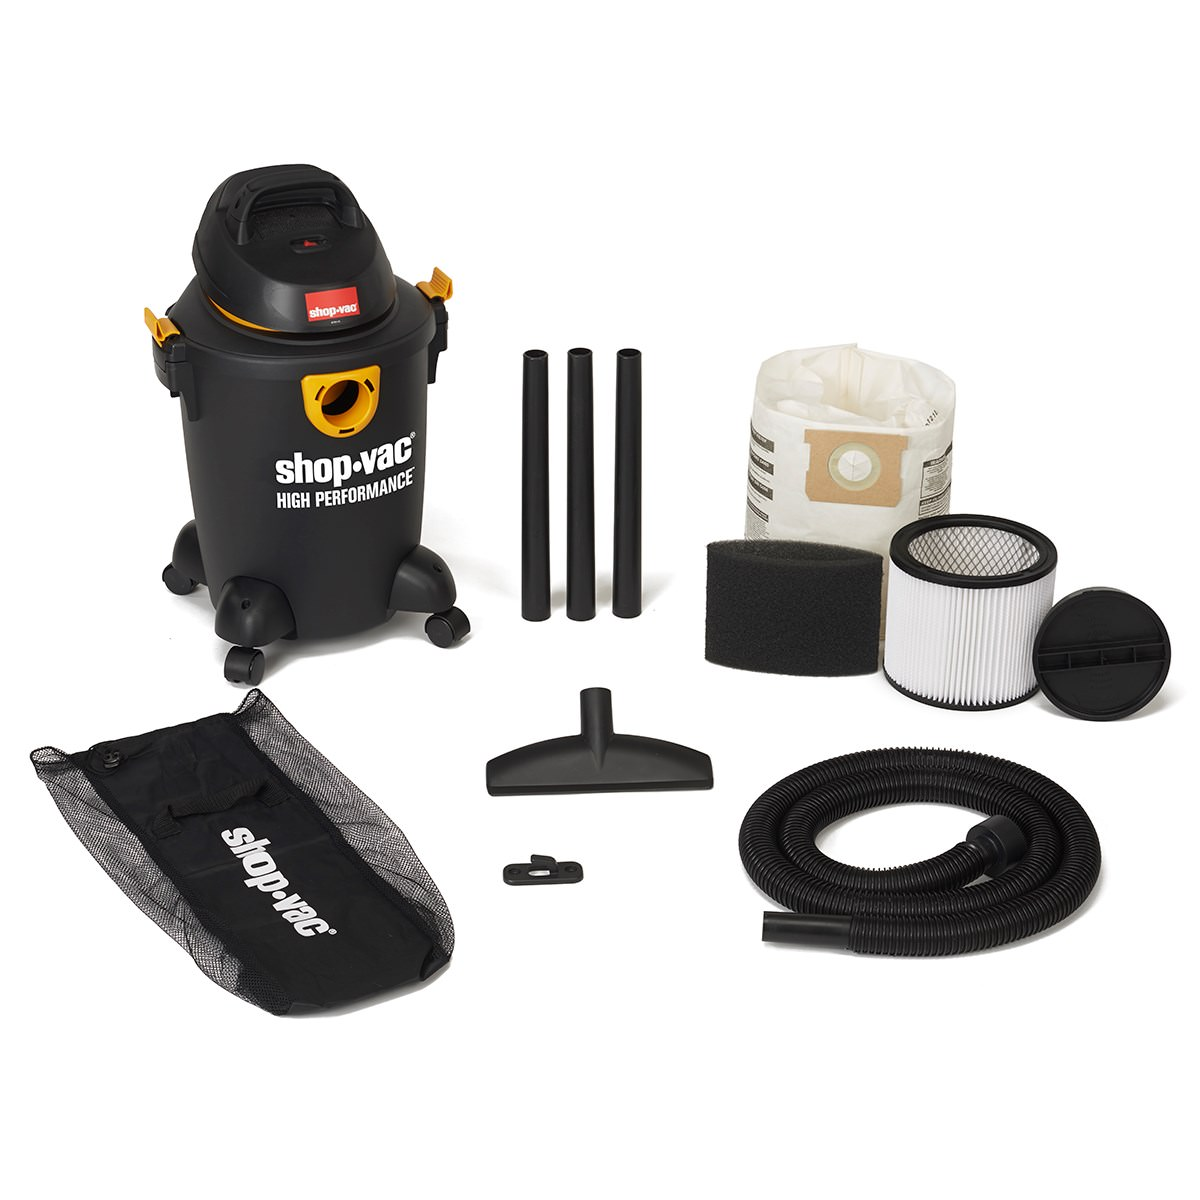 Shop-Vac 6 Gallon 3.5 Peak HP High Performance Wet   Dry Vacuum by SHOP VAC CORPORATION